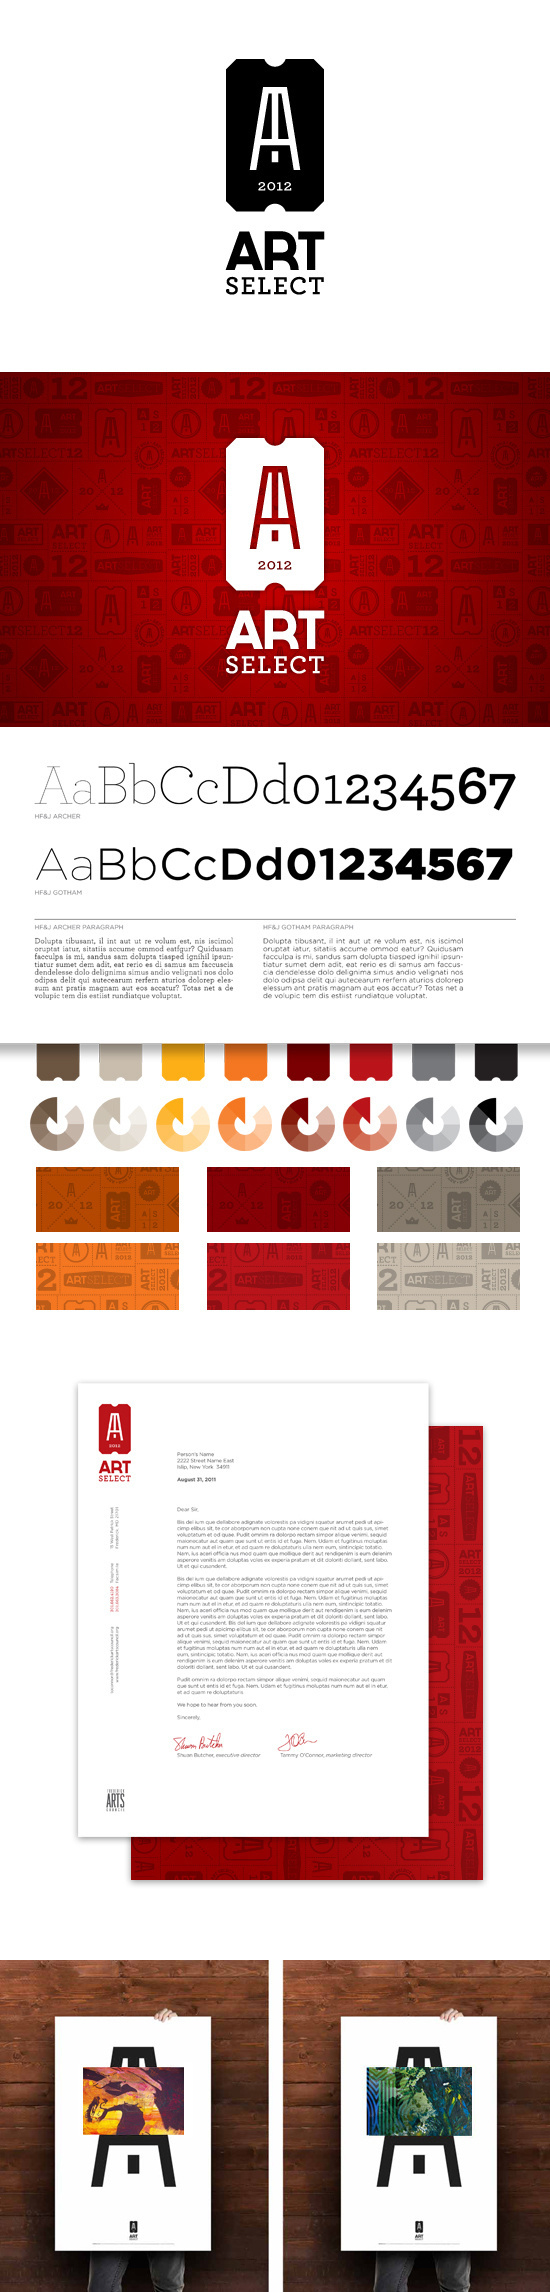 ArtSelect Identity #pattern #business #branding #card #brand #identity #stationery #logo #typography